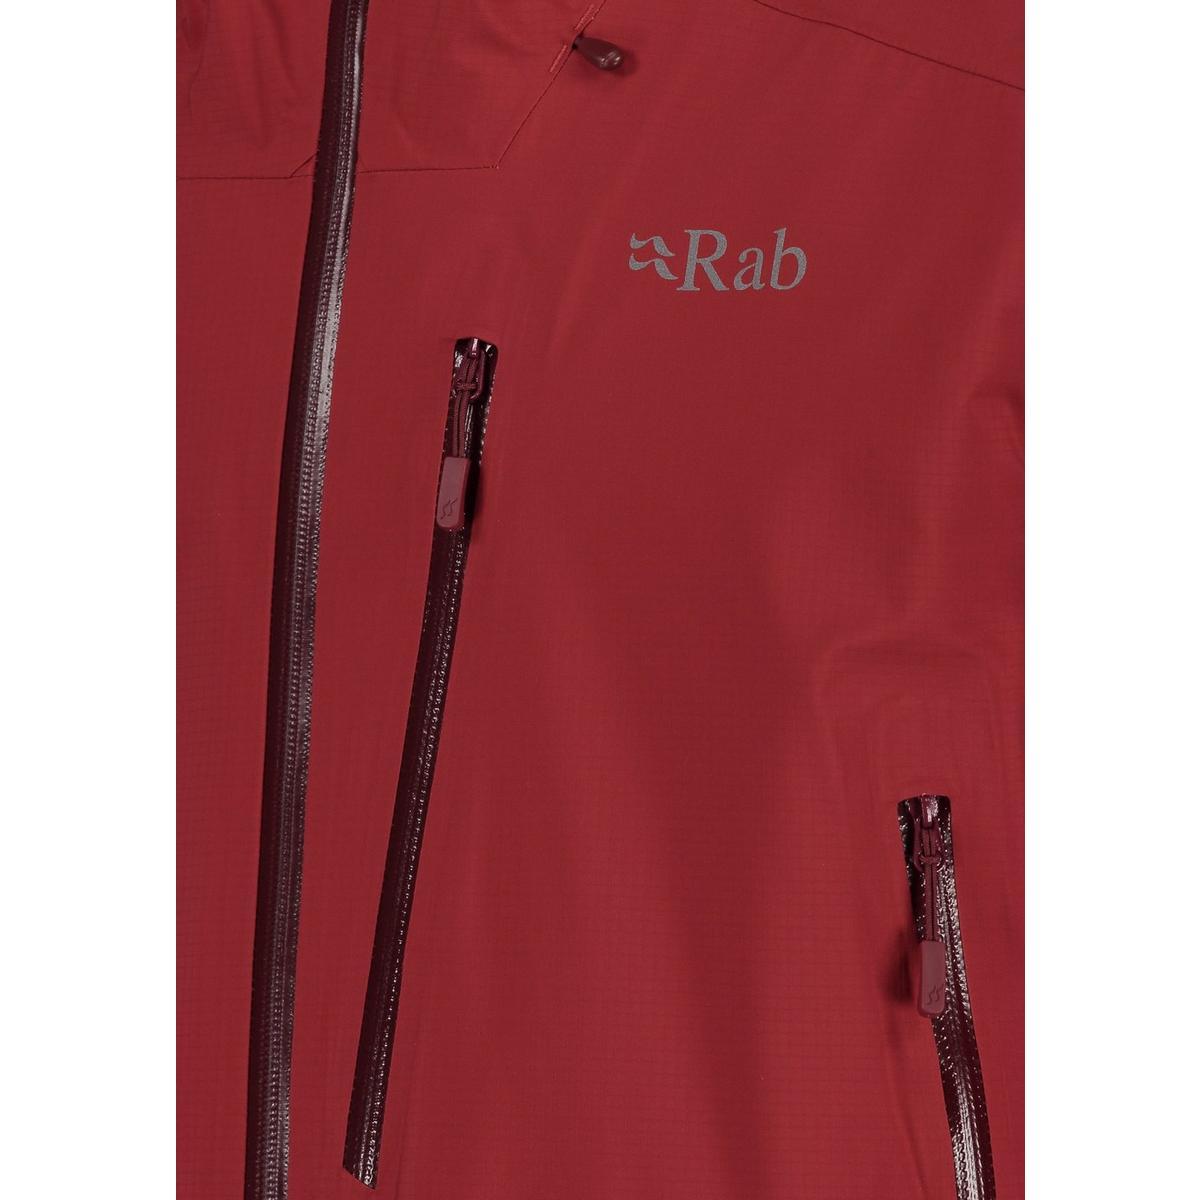 Rab Men's Firewall Jacket - Ascent Red